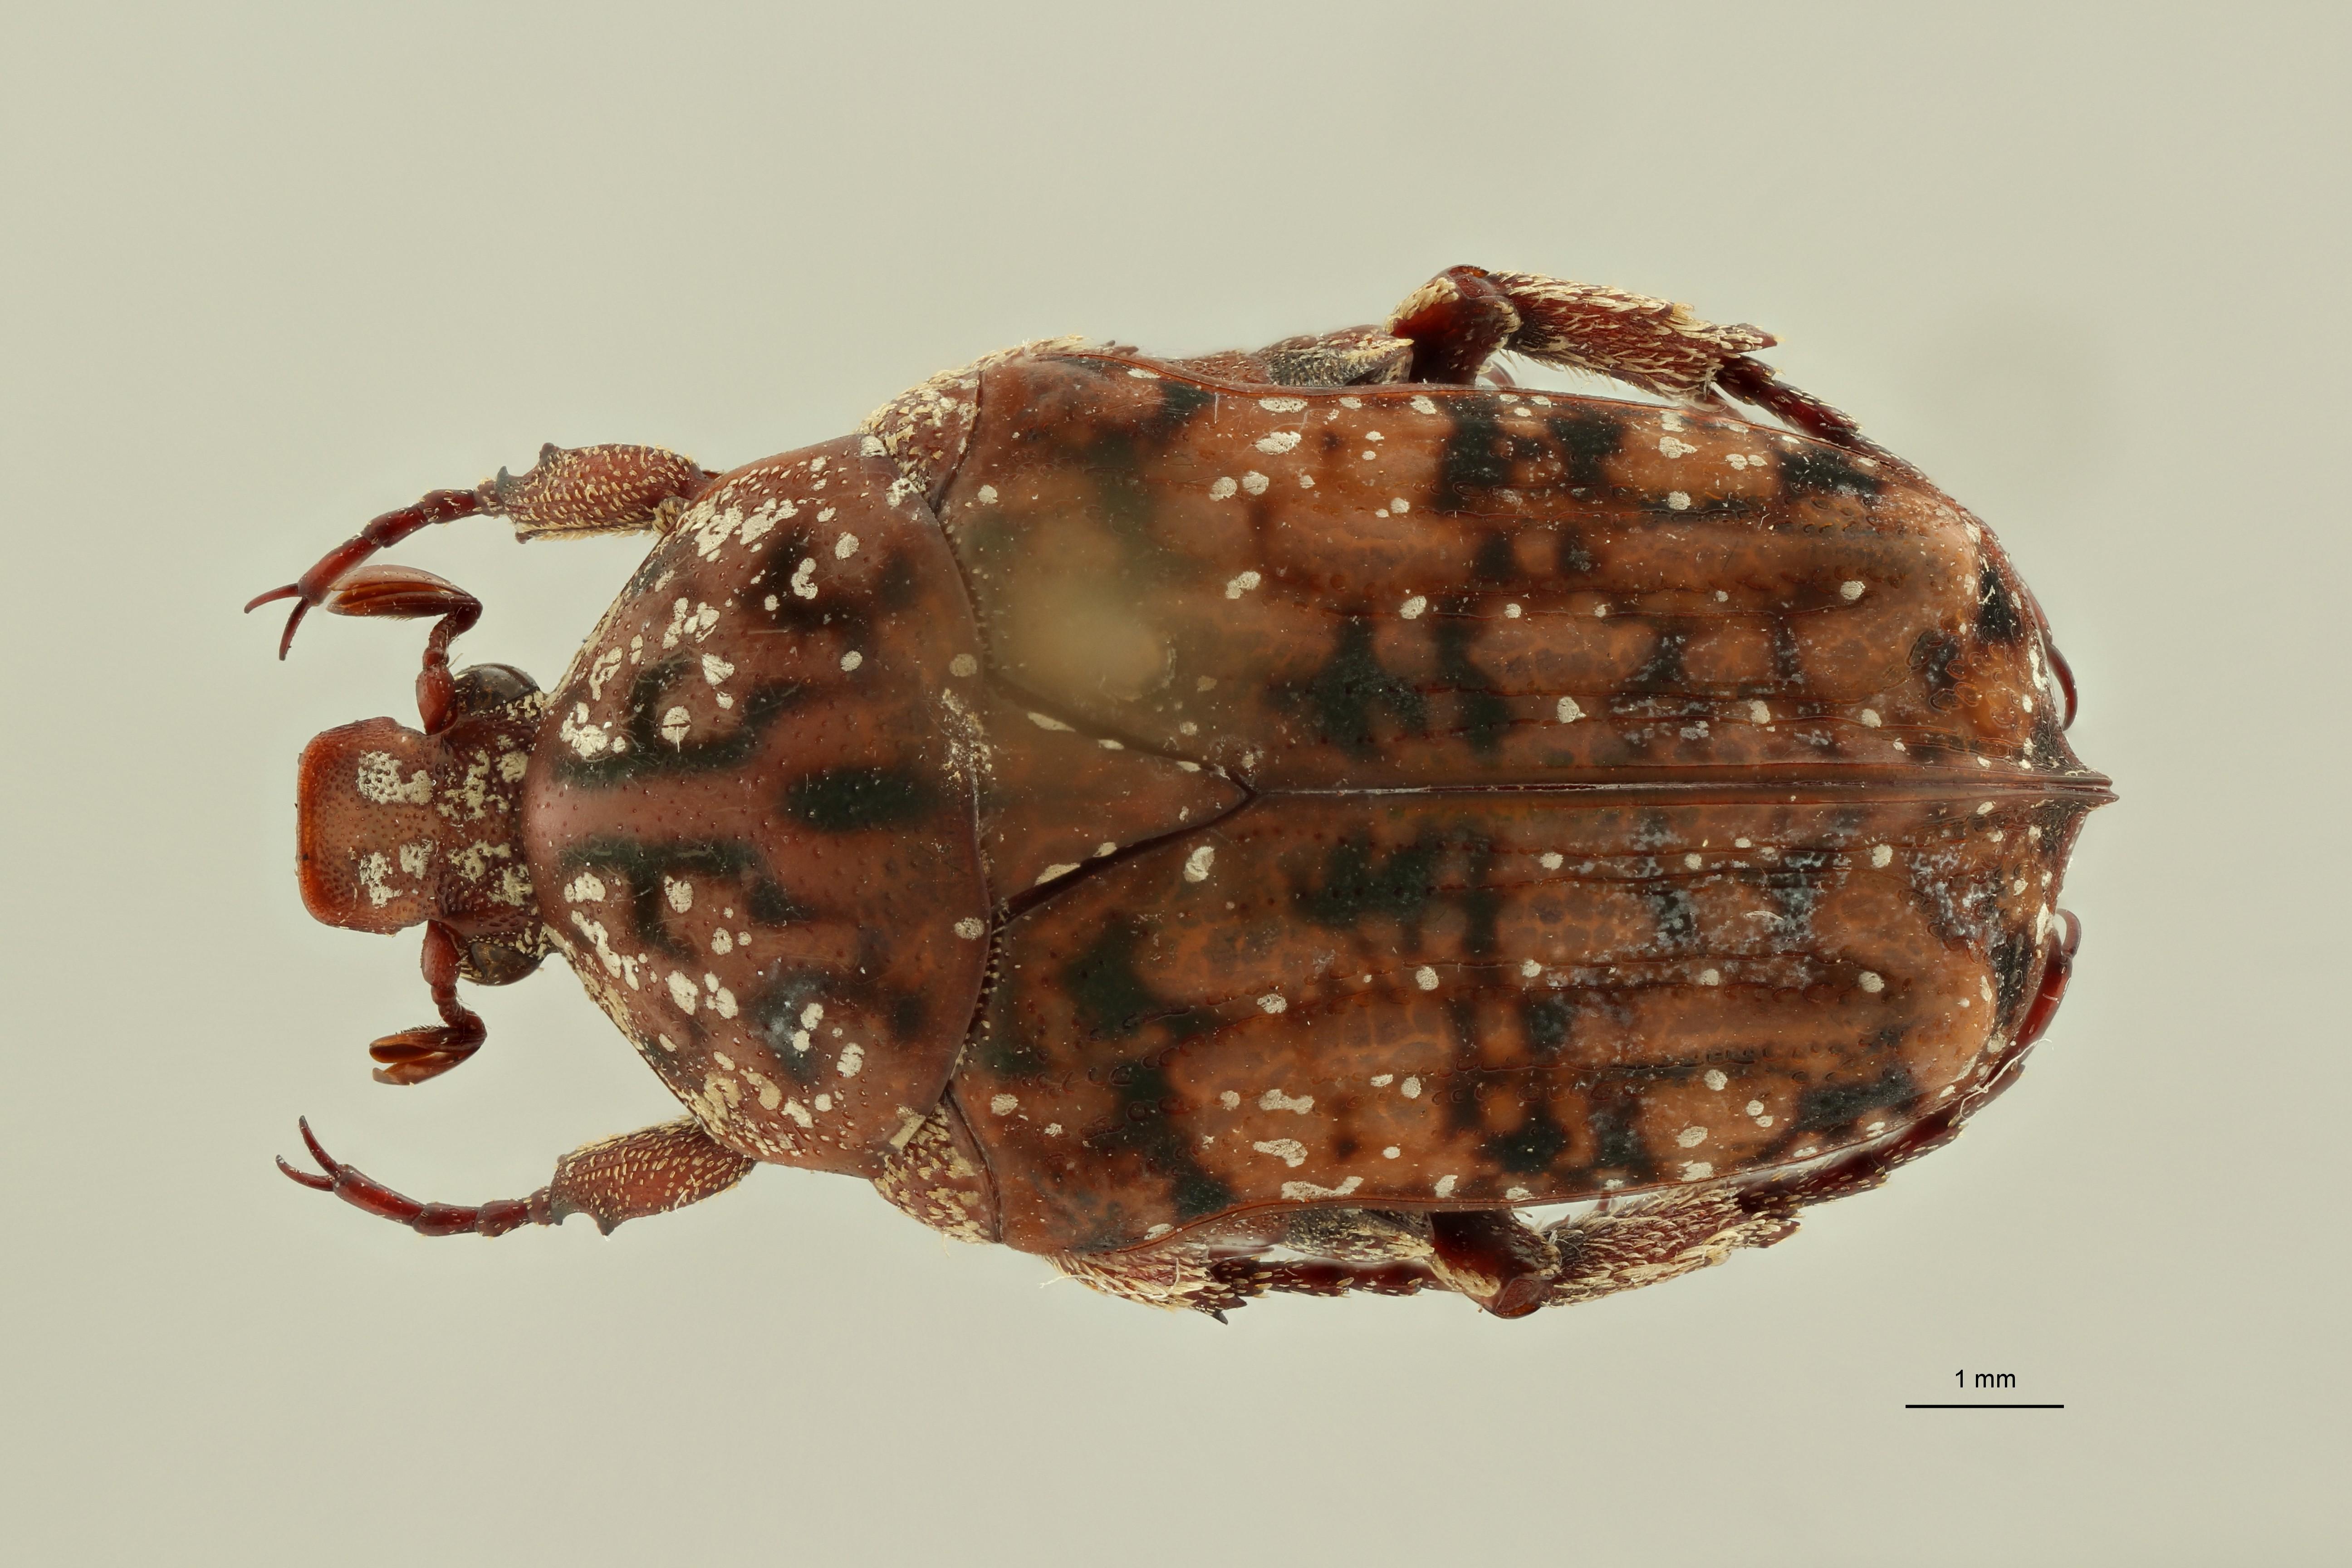 Atrichelaphinis (Eugeaphinis) deplanata minettii pt1 D ZS PMax Scaled.jpeg